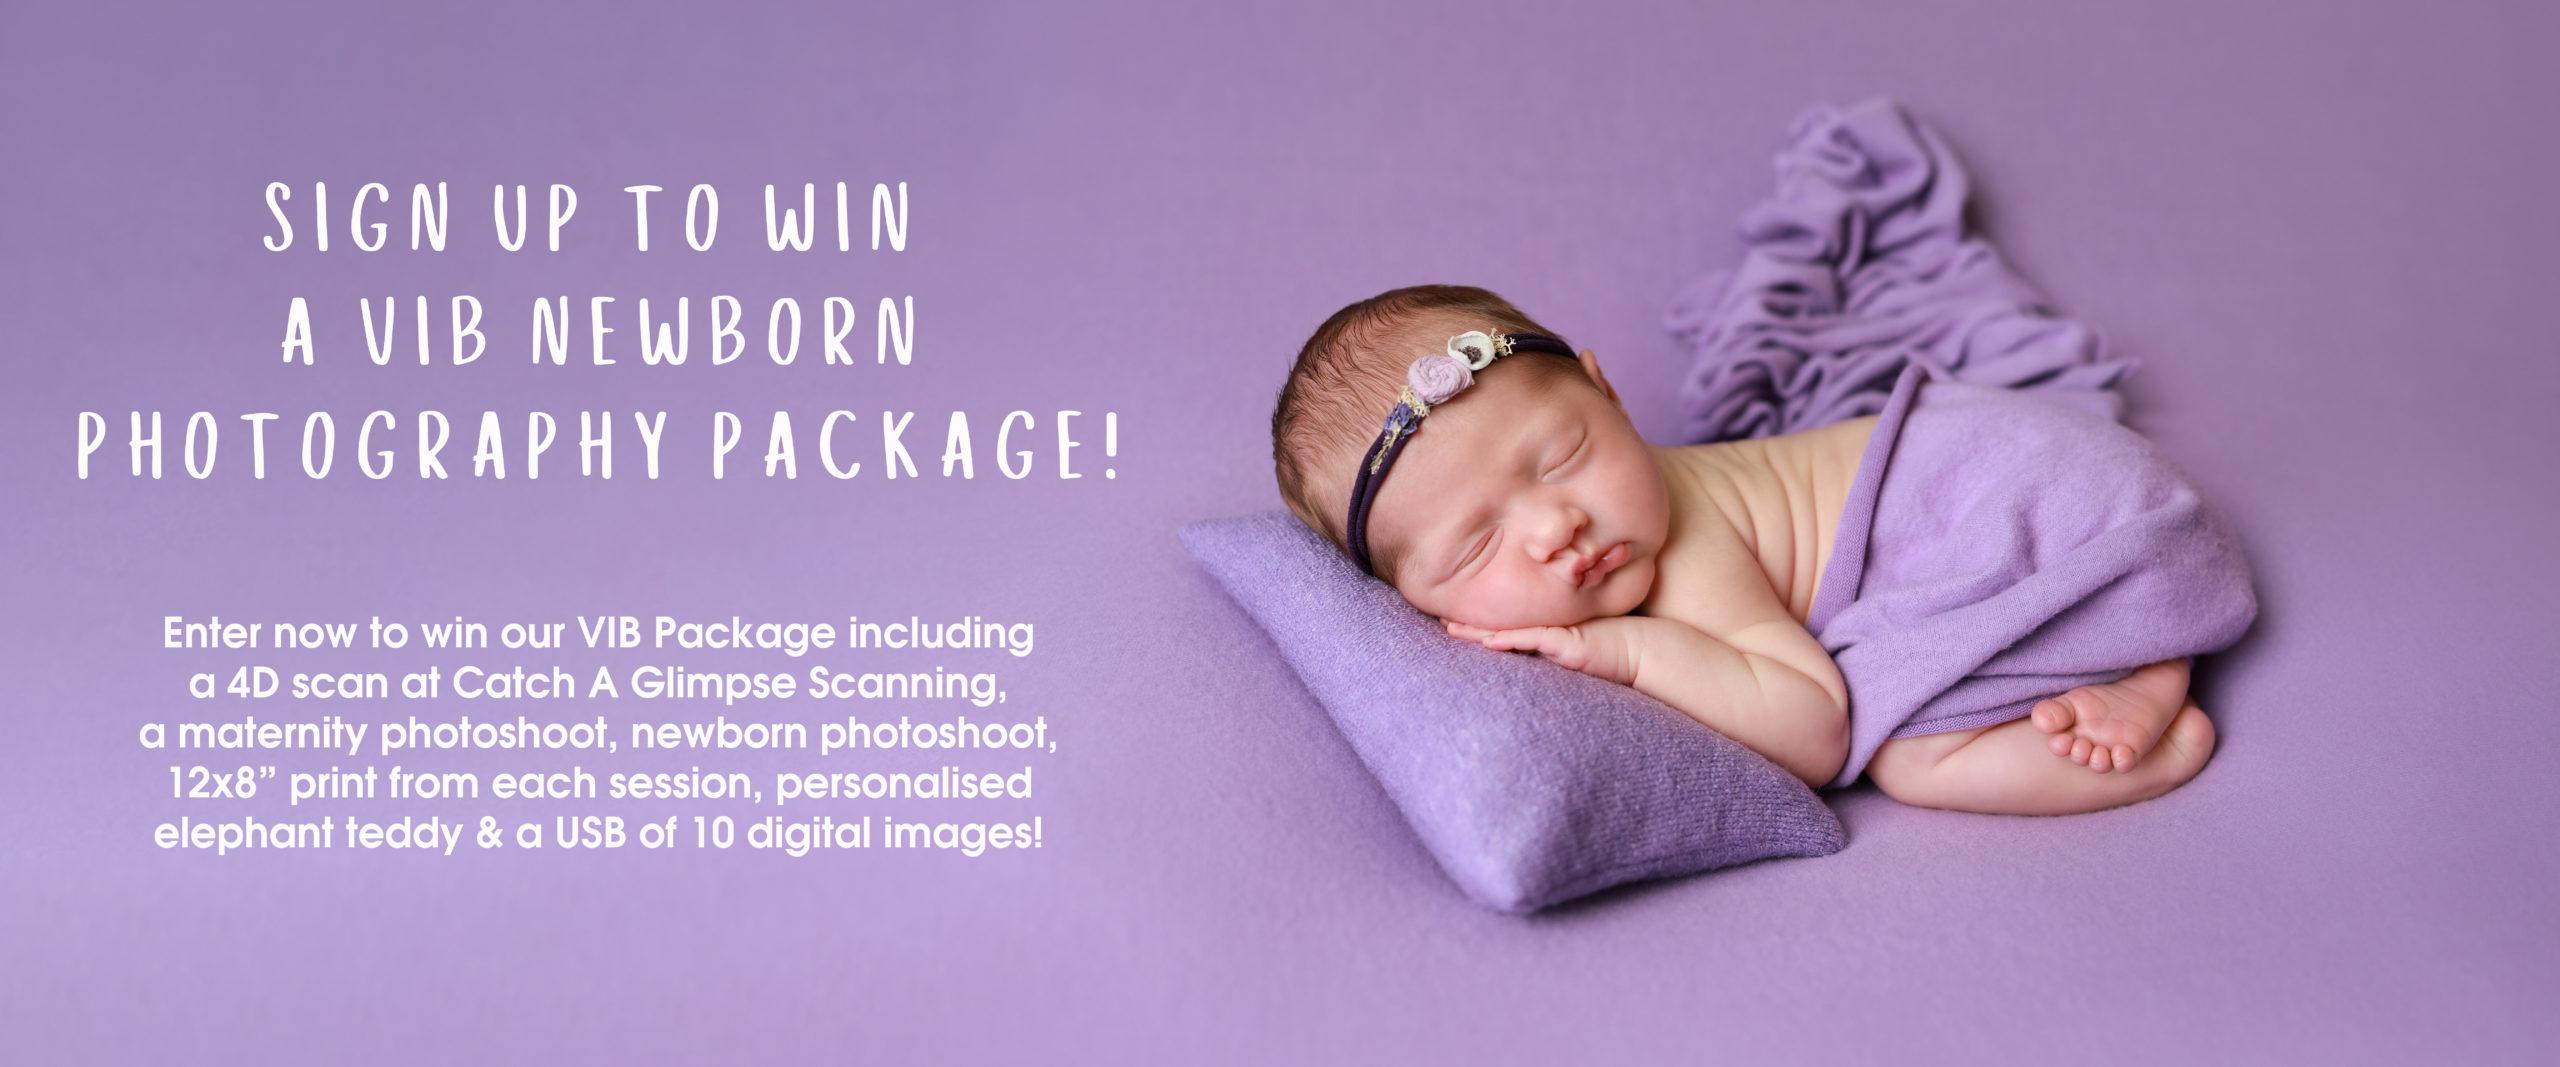 baby girl newborn photoshoot on purple backdrop wearing purple flower headband